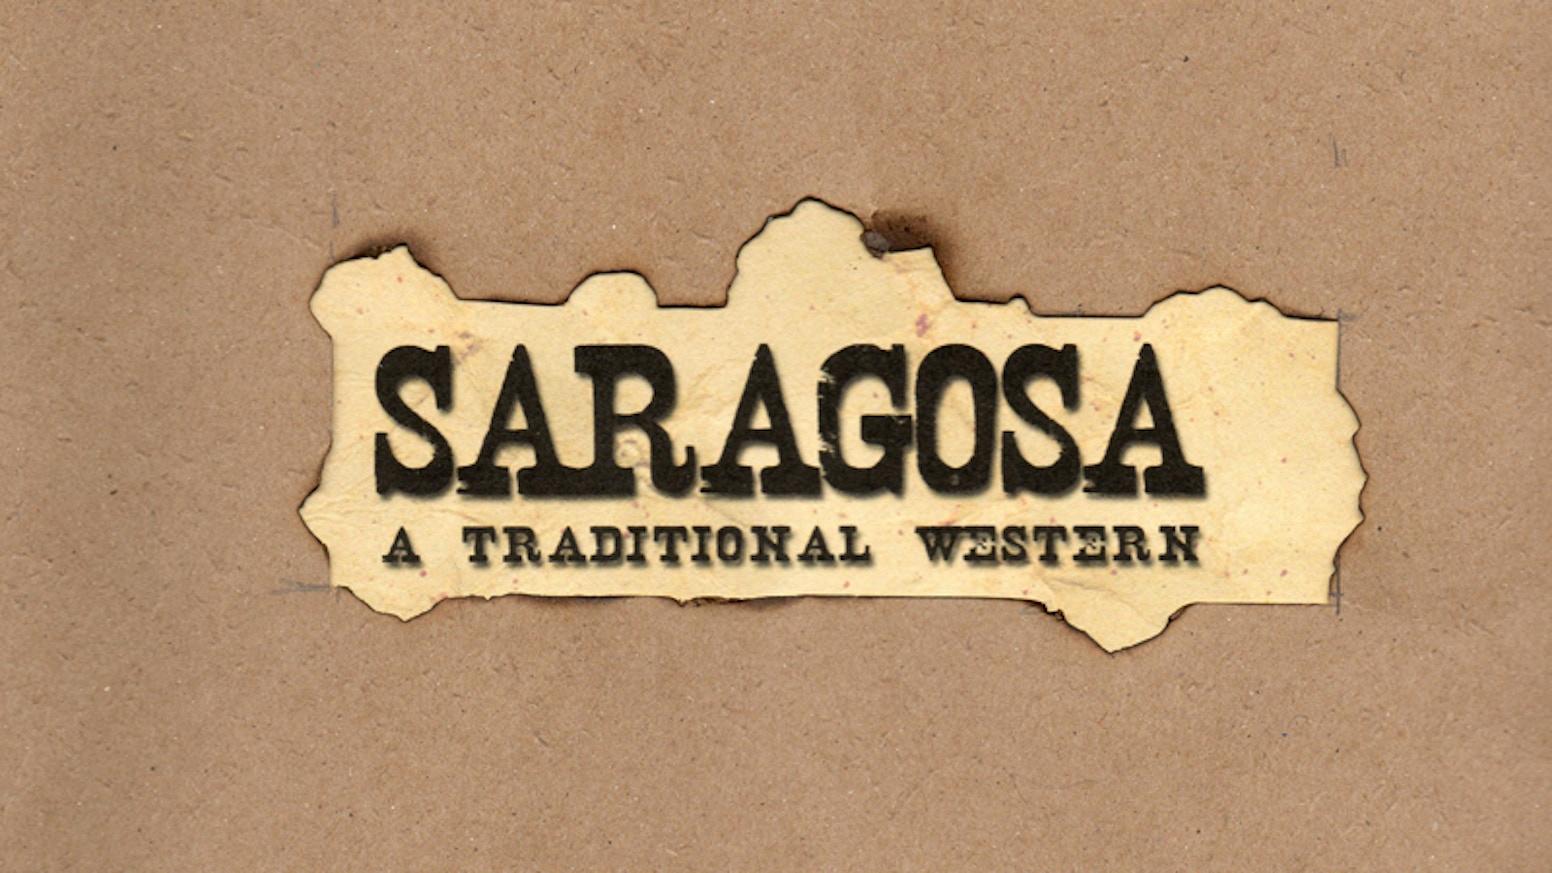 Saragosa - The Western Genre Reborn by Rey Ramirez » The